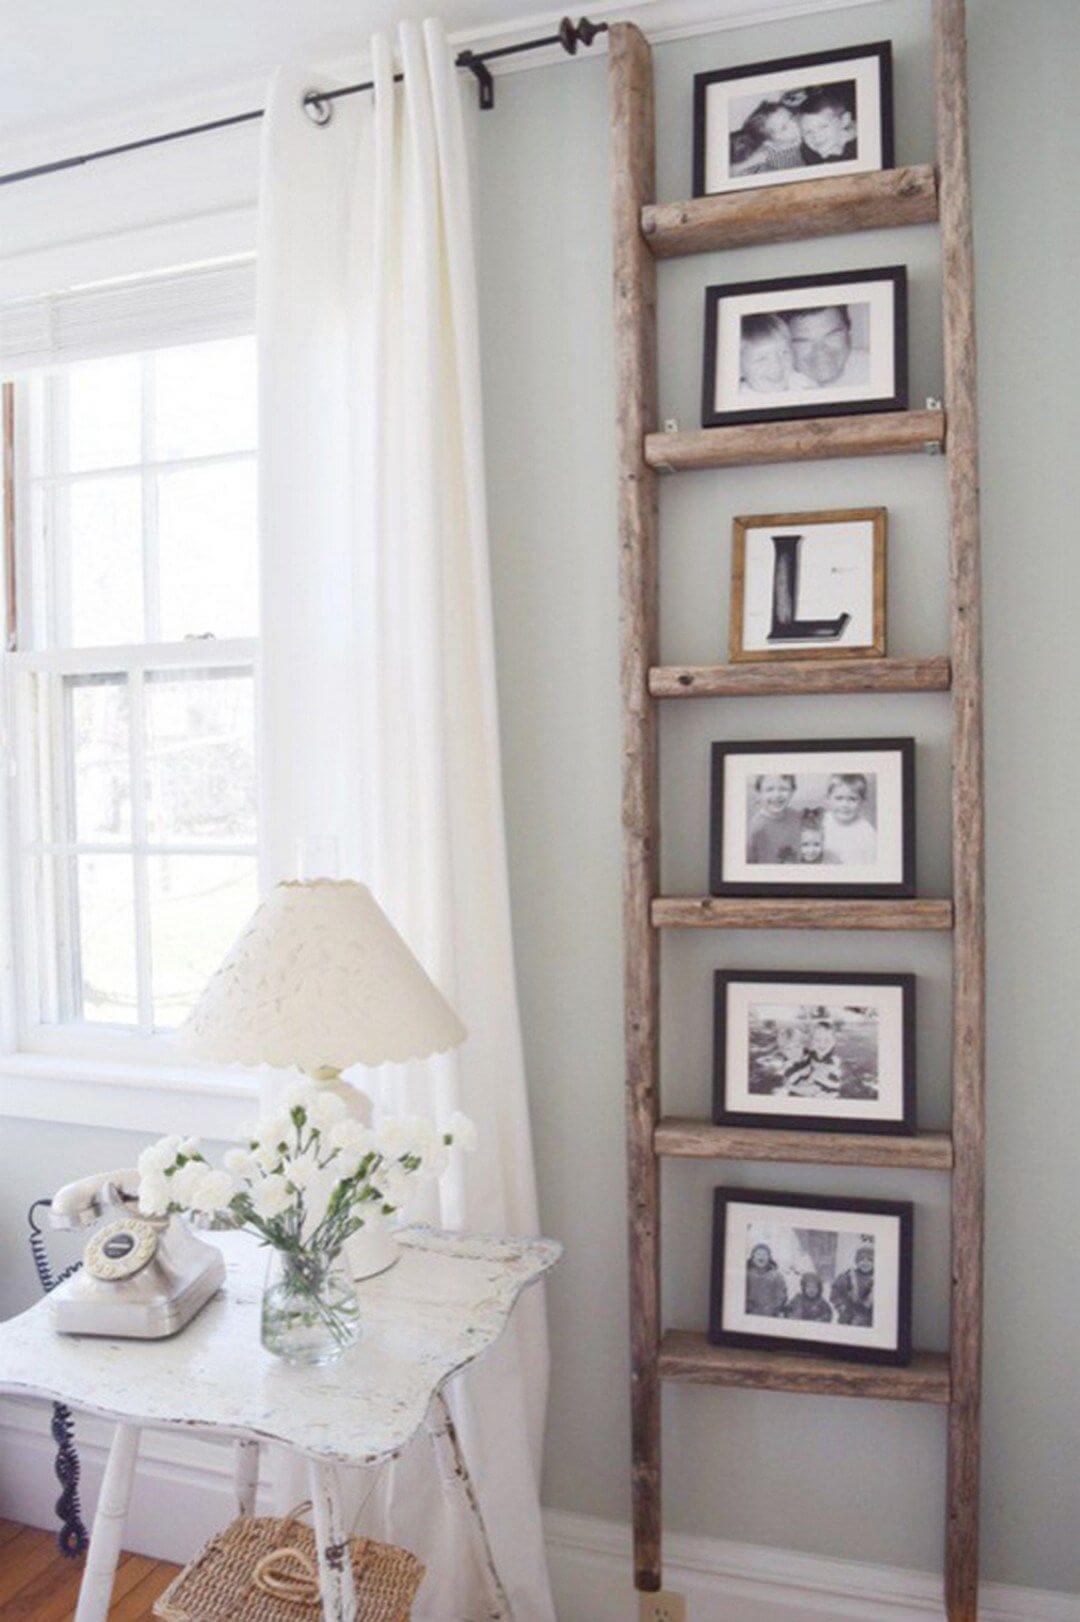 Vertical Ladder Photo Frame Farmhouse Decor Display